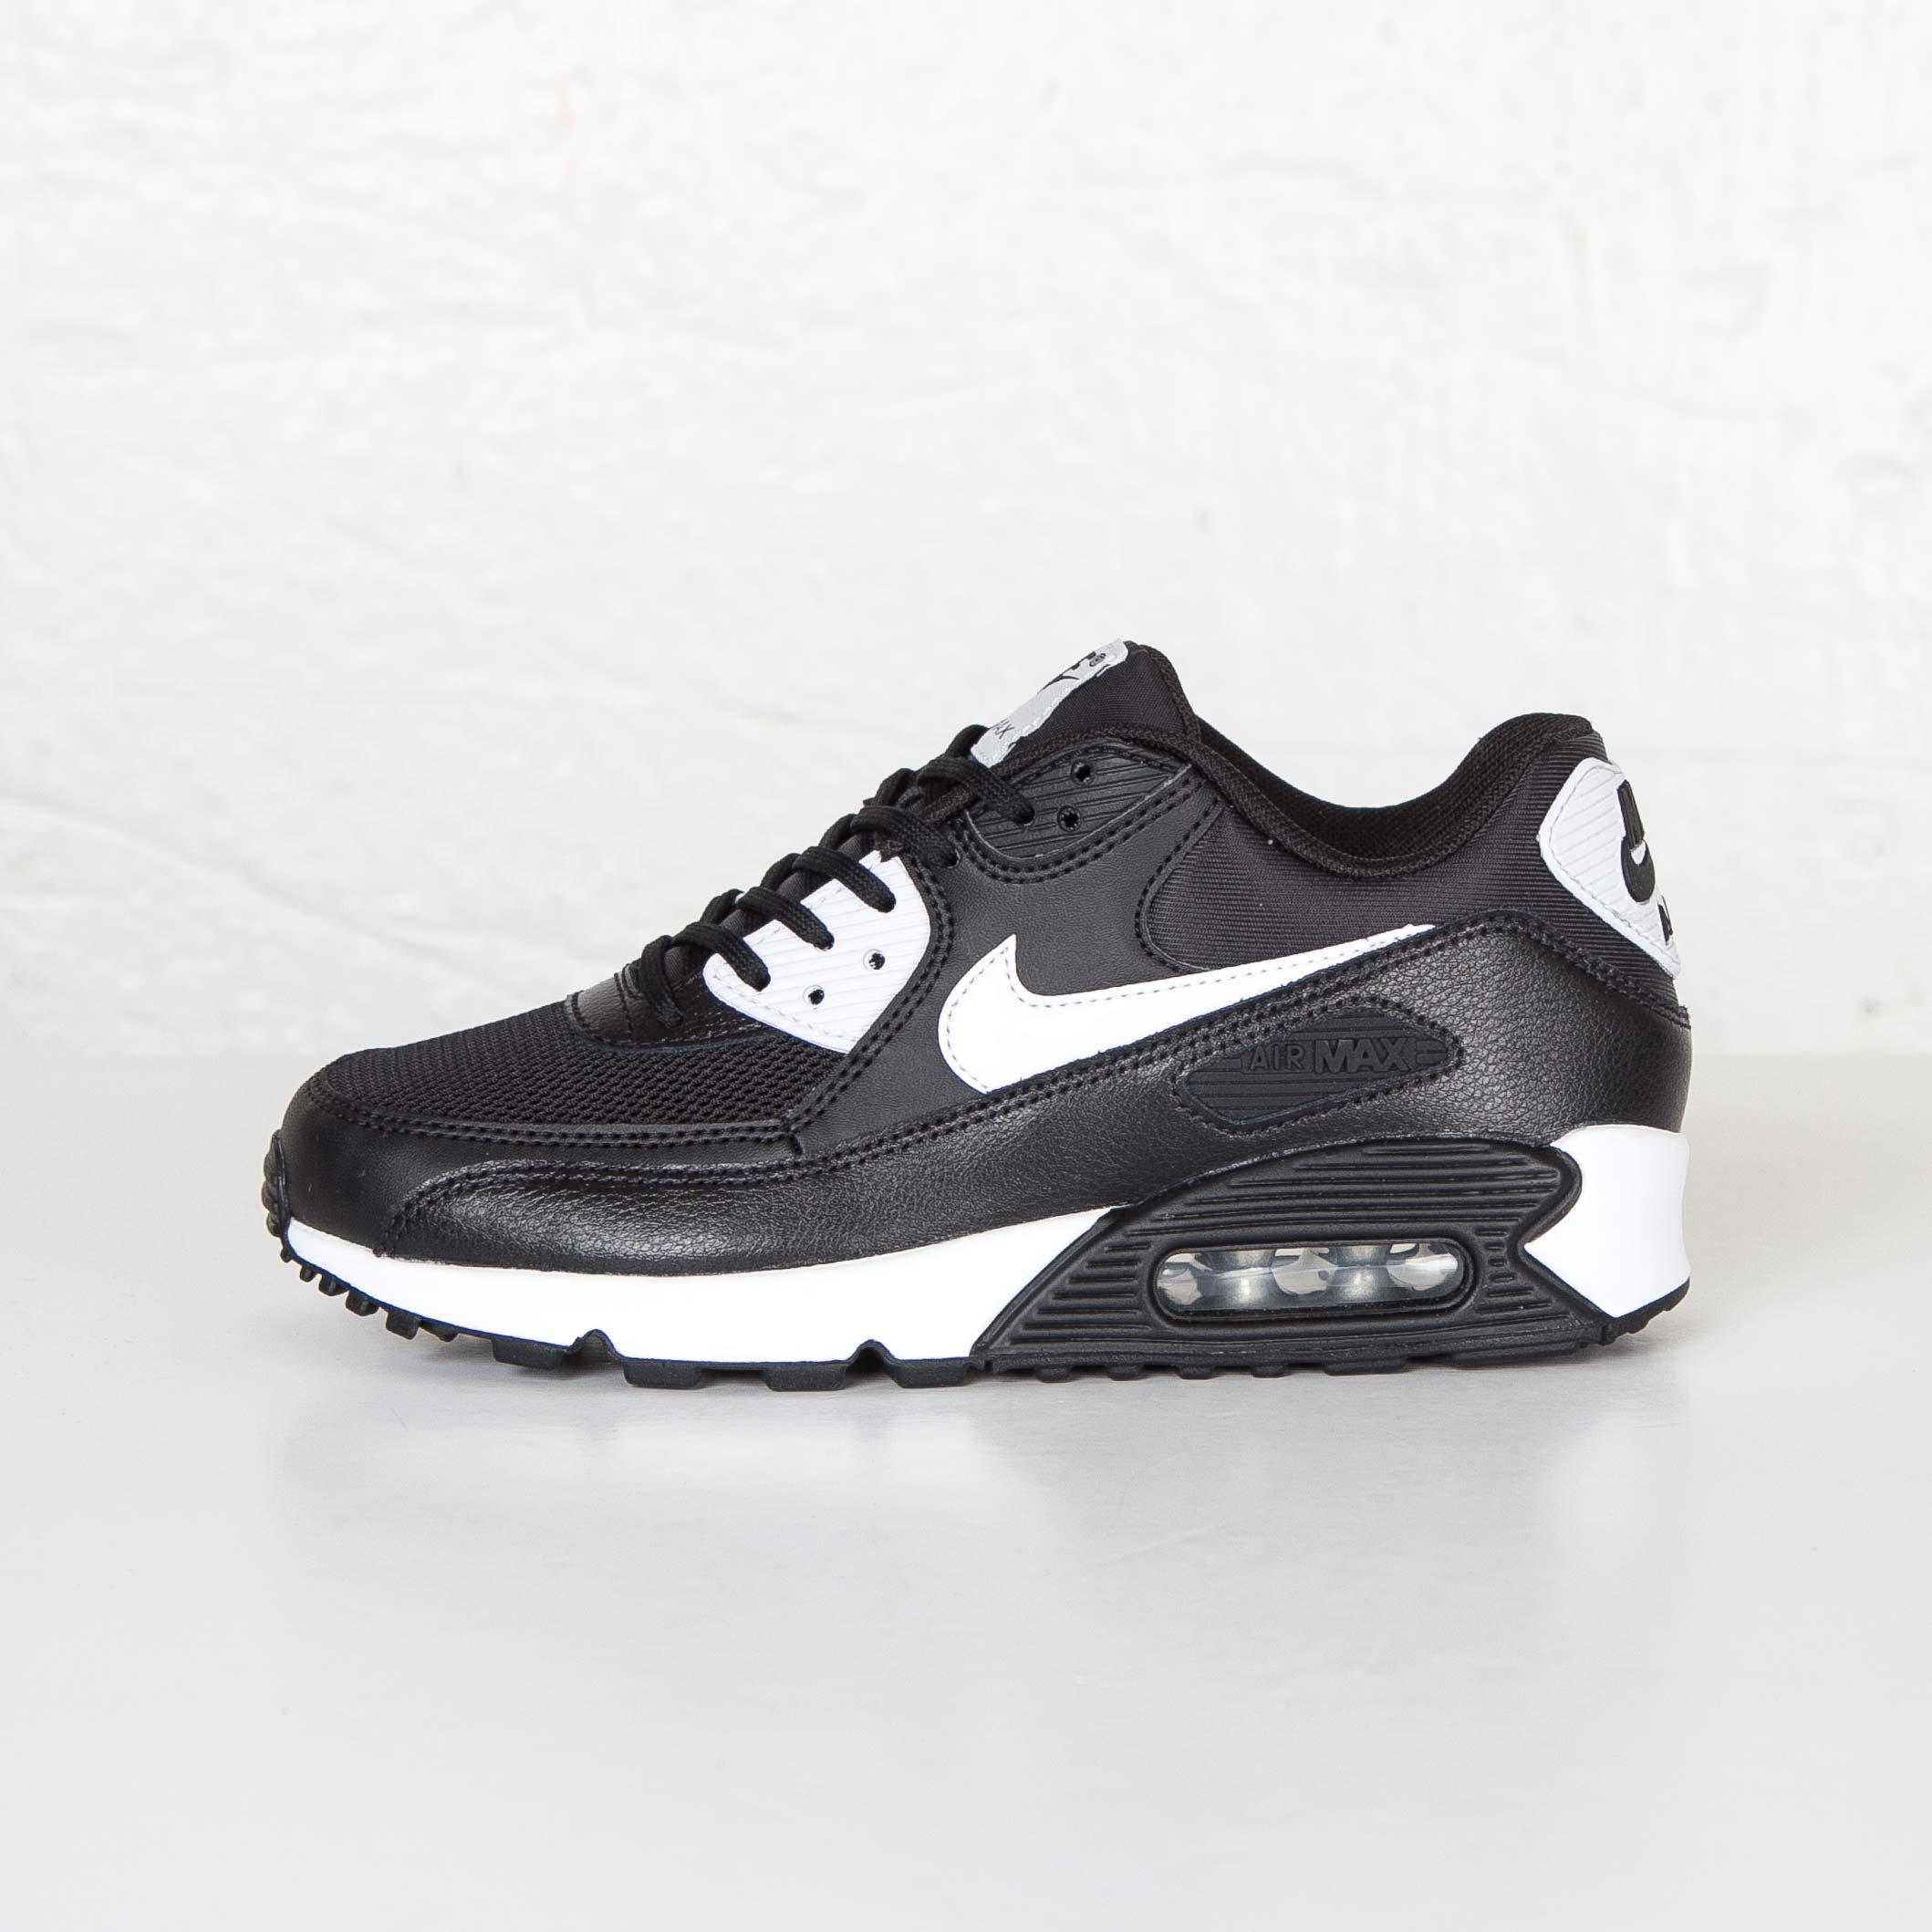 Nike Wmns Air Max 90 Essential 616730 023 Sneakersnstuff